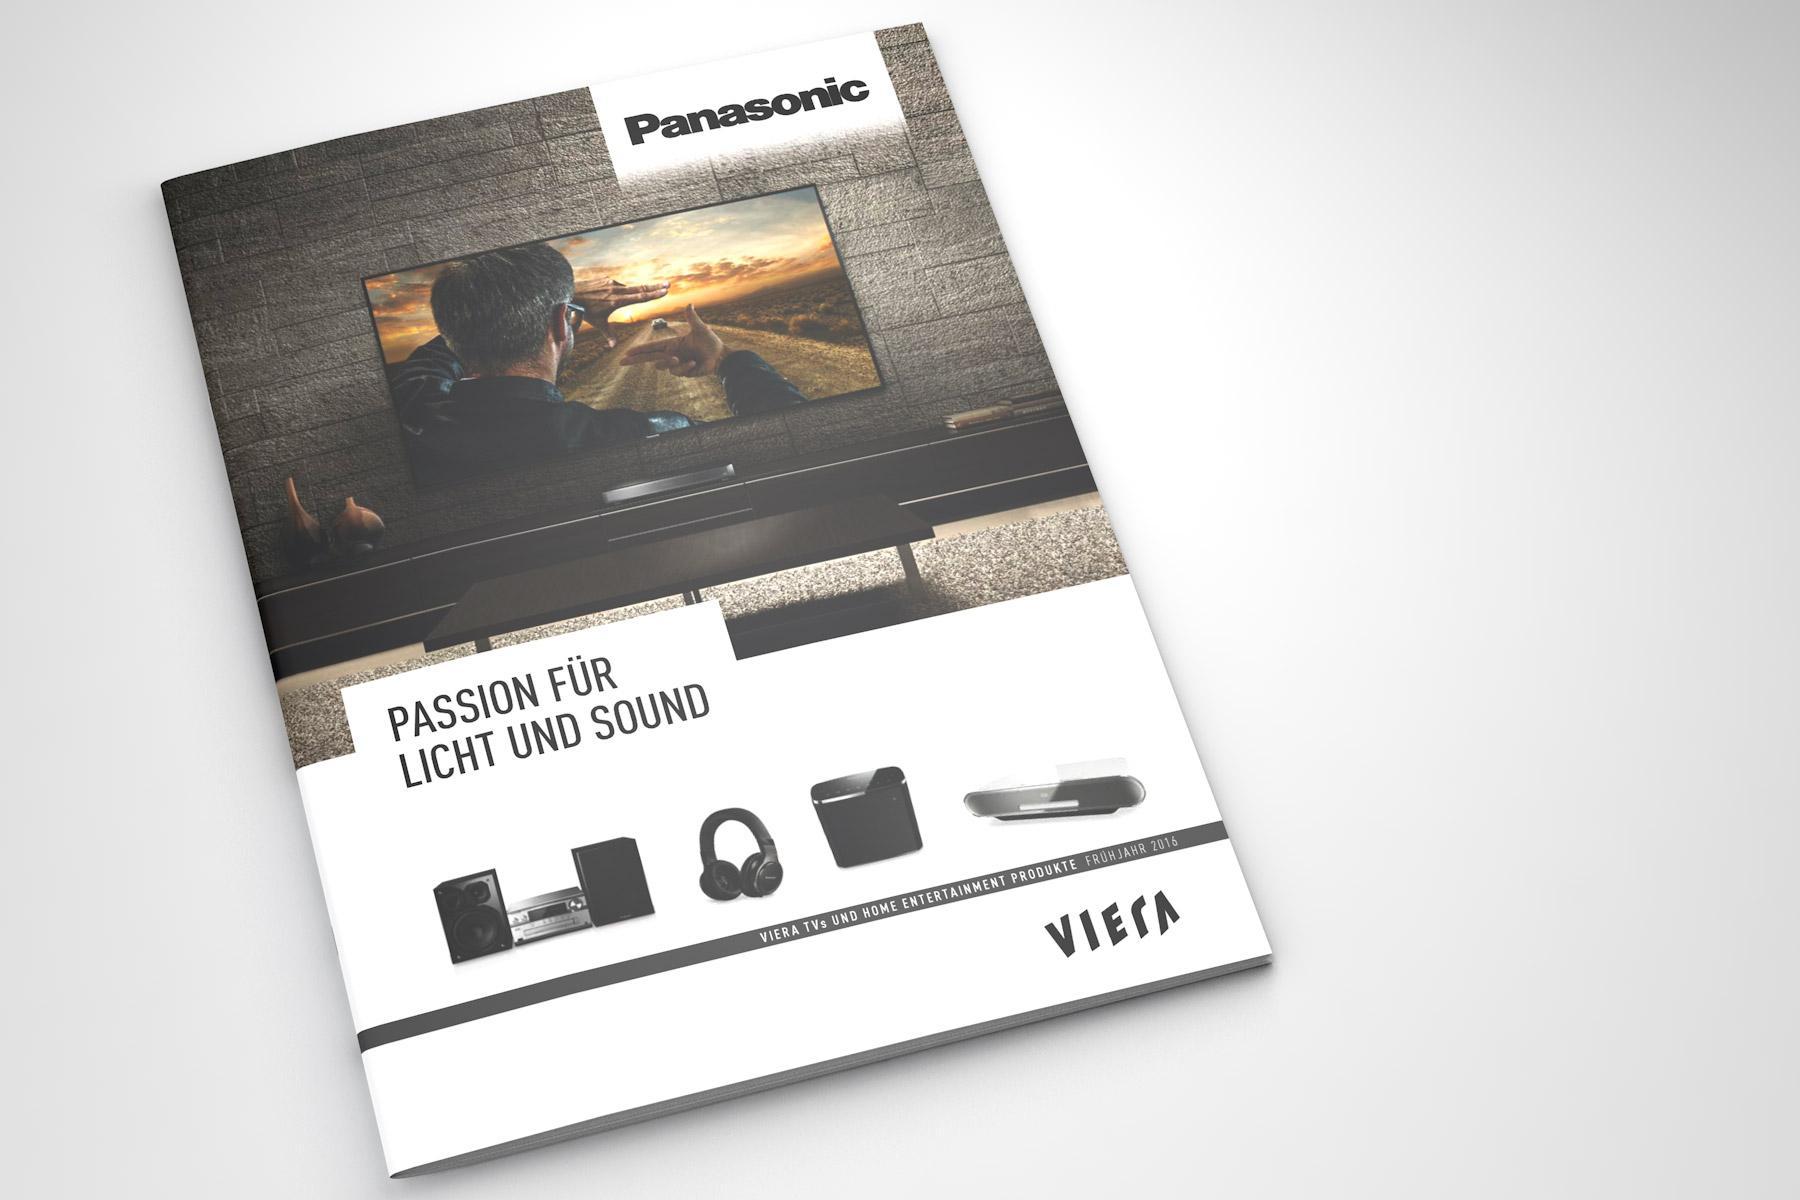 Panasonic Home Entertainment Broschüre